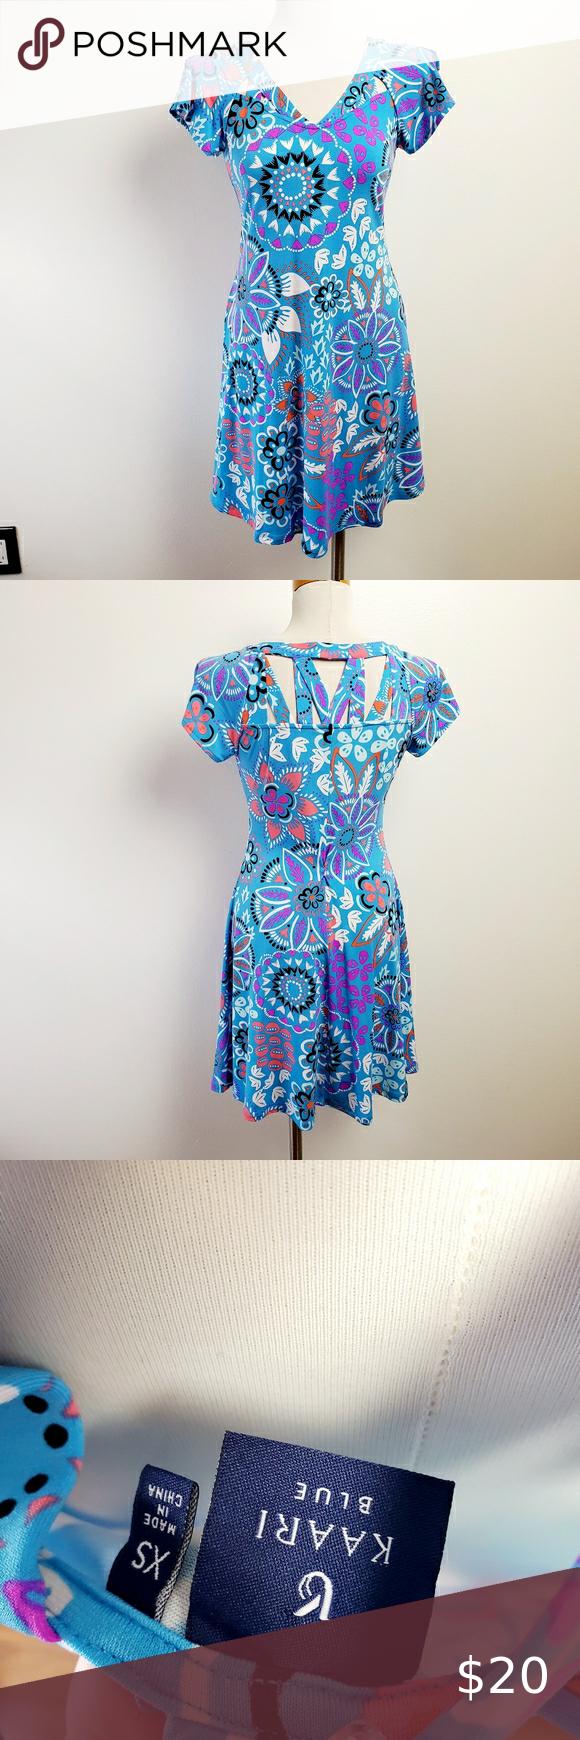 Kaari Blue Xs Cute Flower Dress Flower Dresses Dresses Clothes Design [ 1740 x 580 Pixel ]